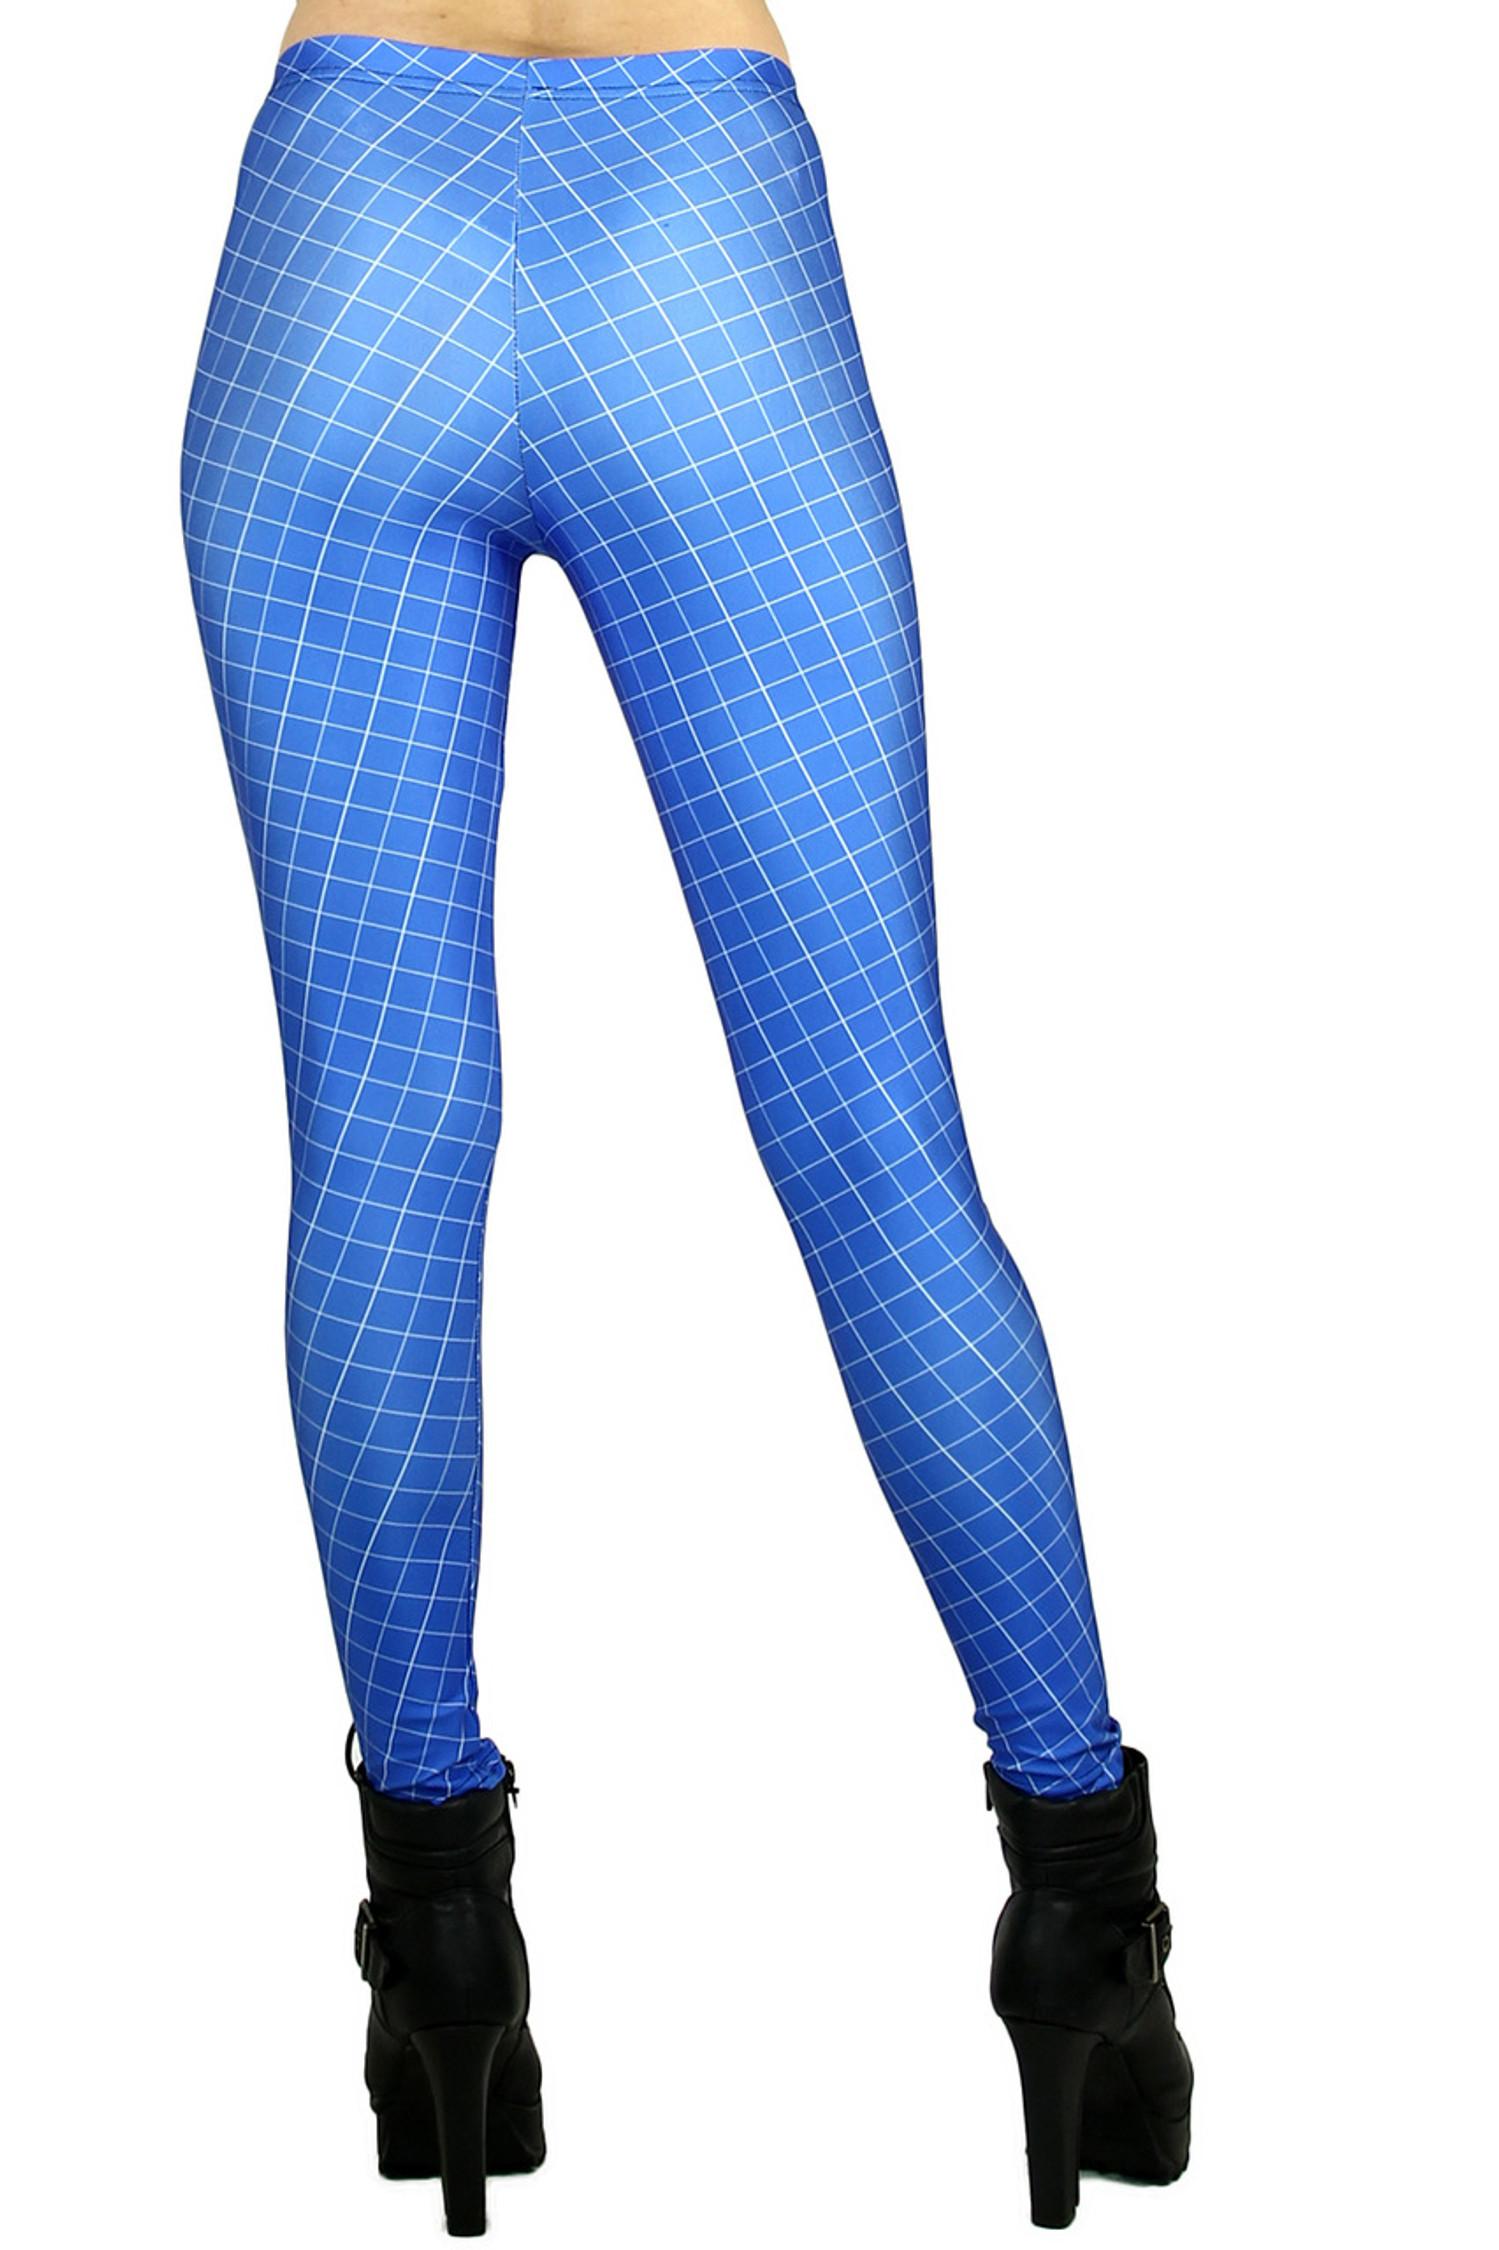 Blue Crisscross Leggings - Plus Size